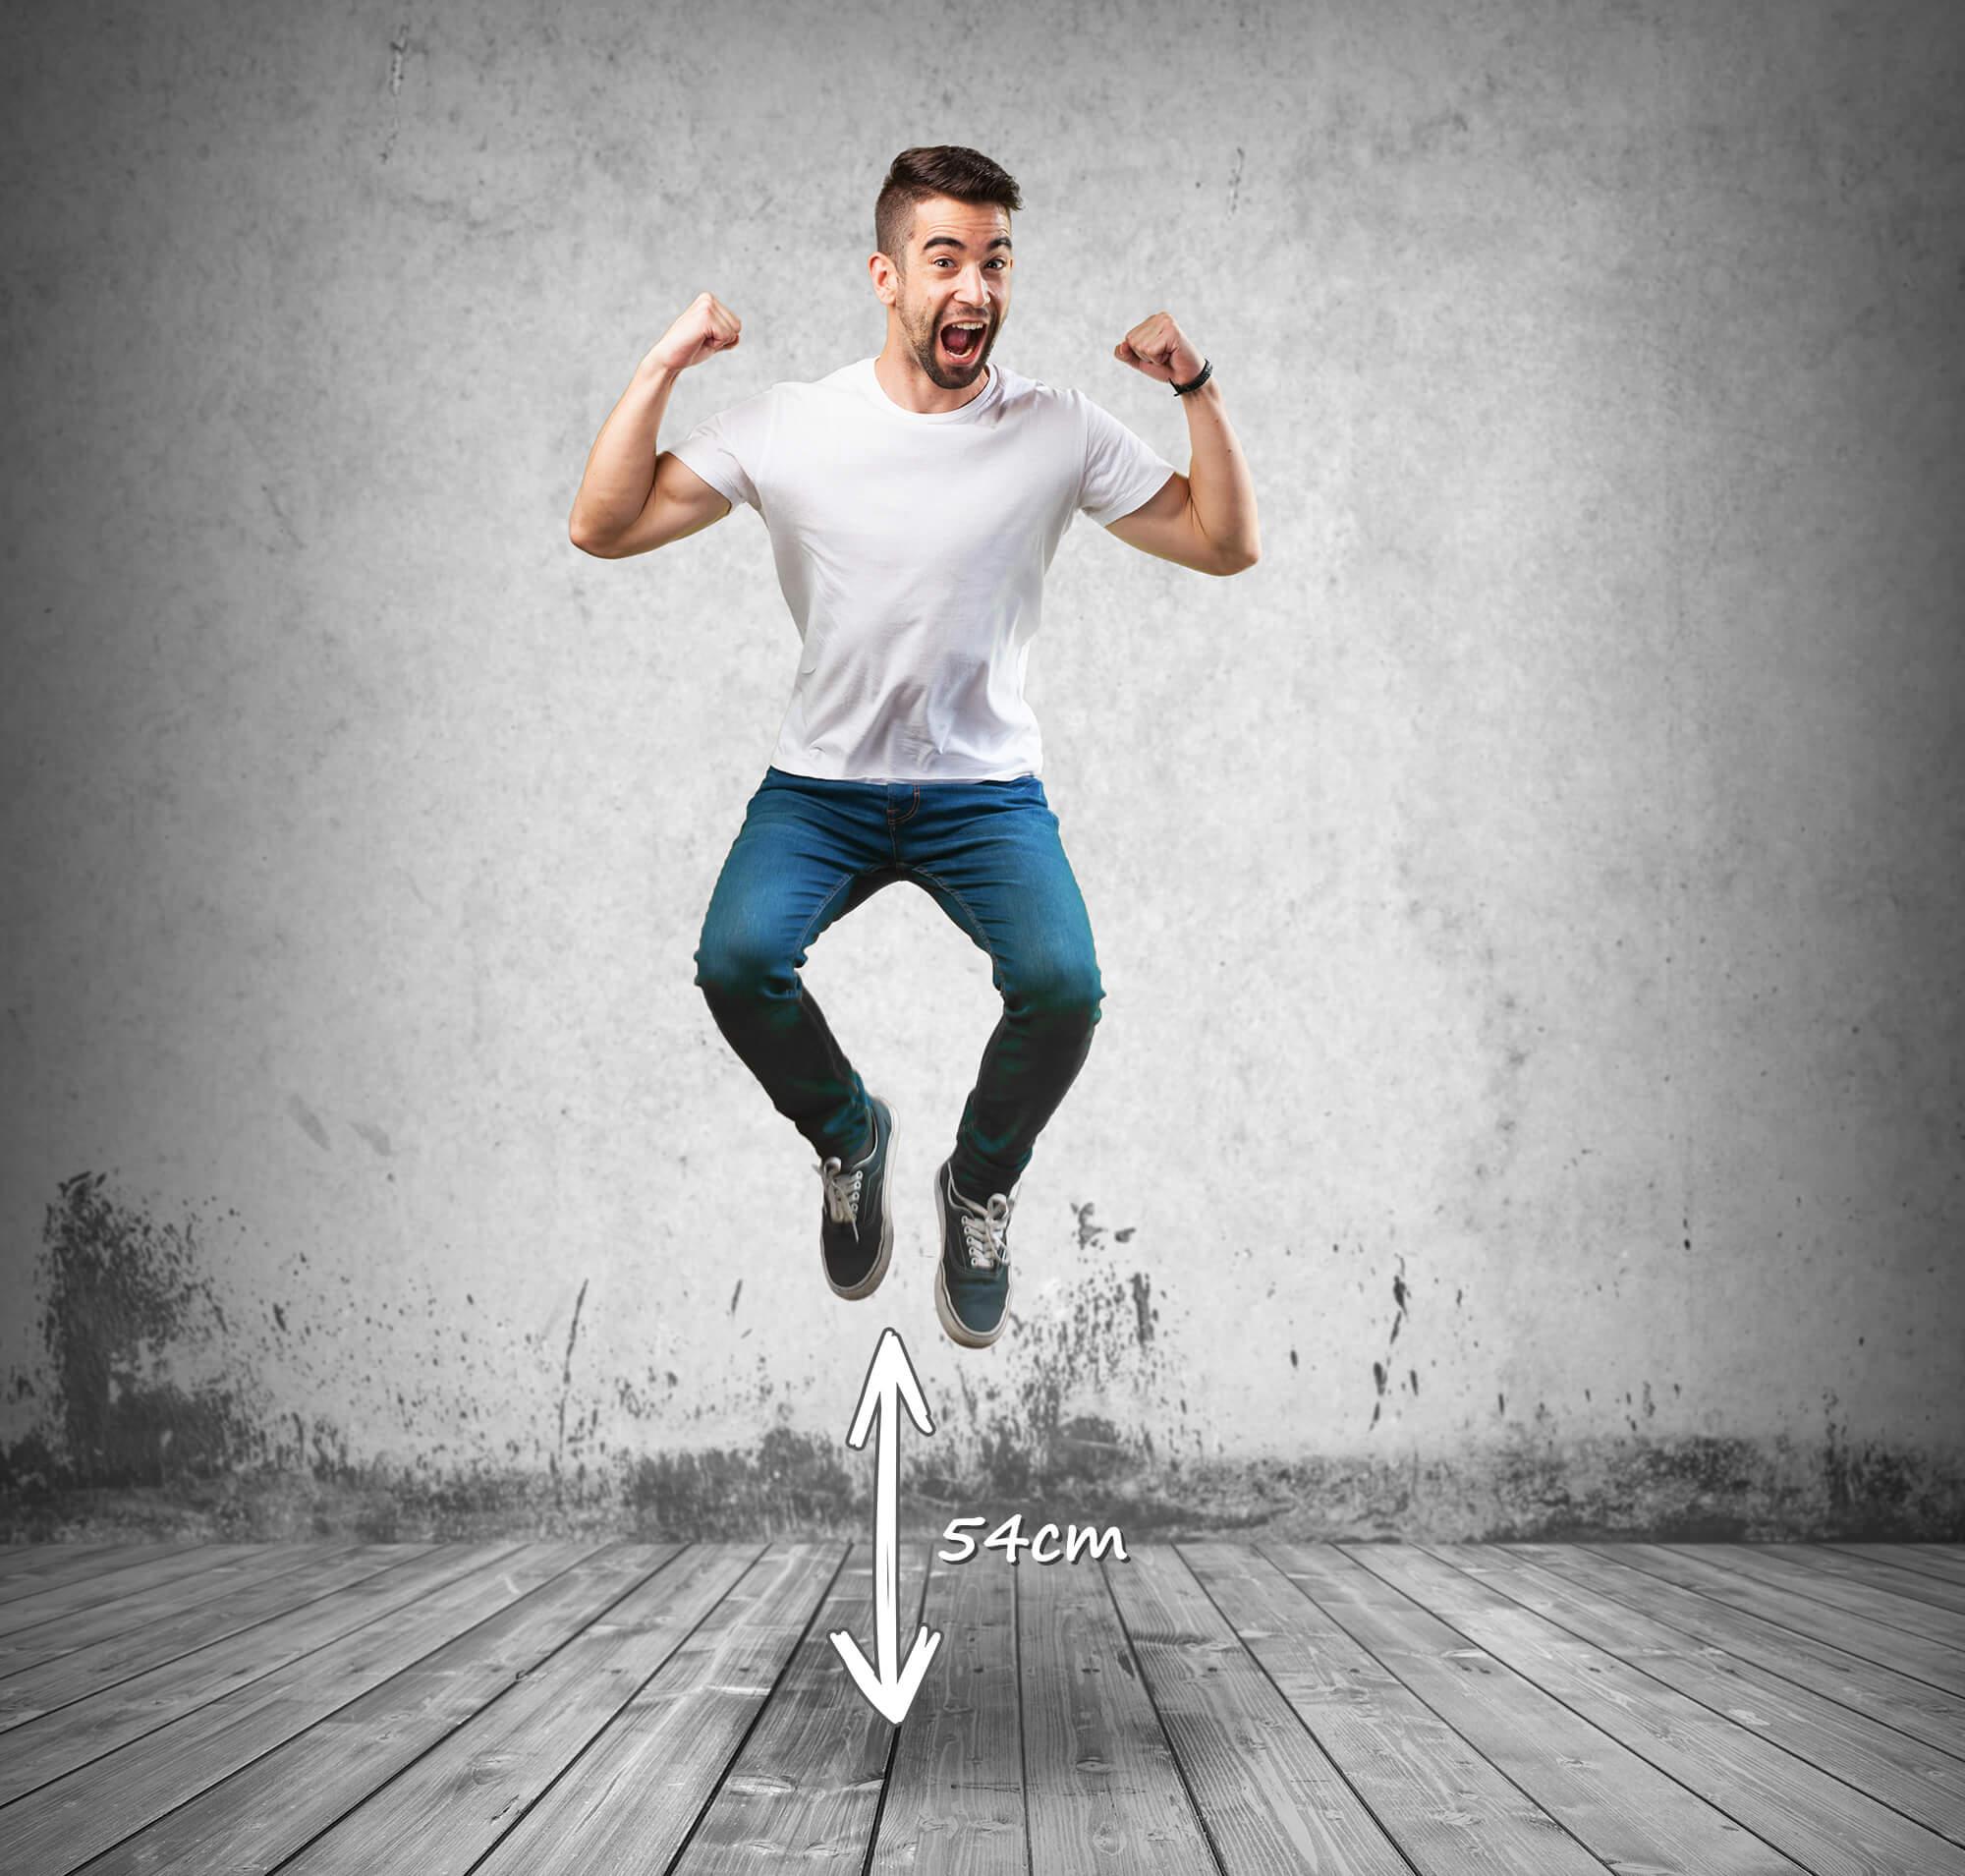 Jump photo